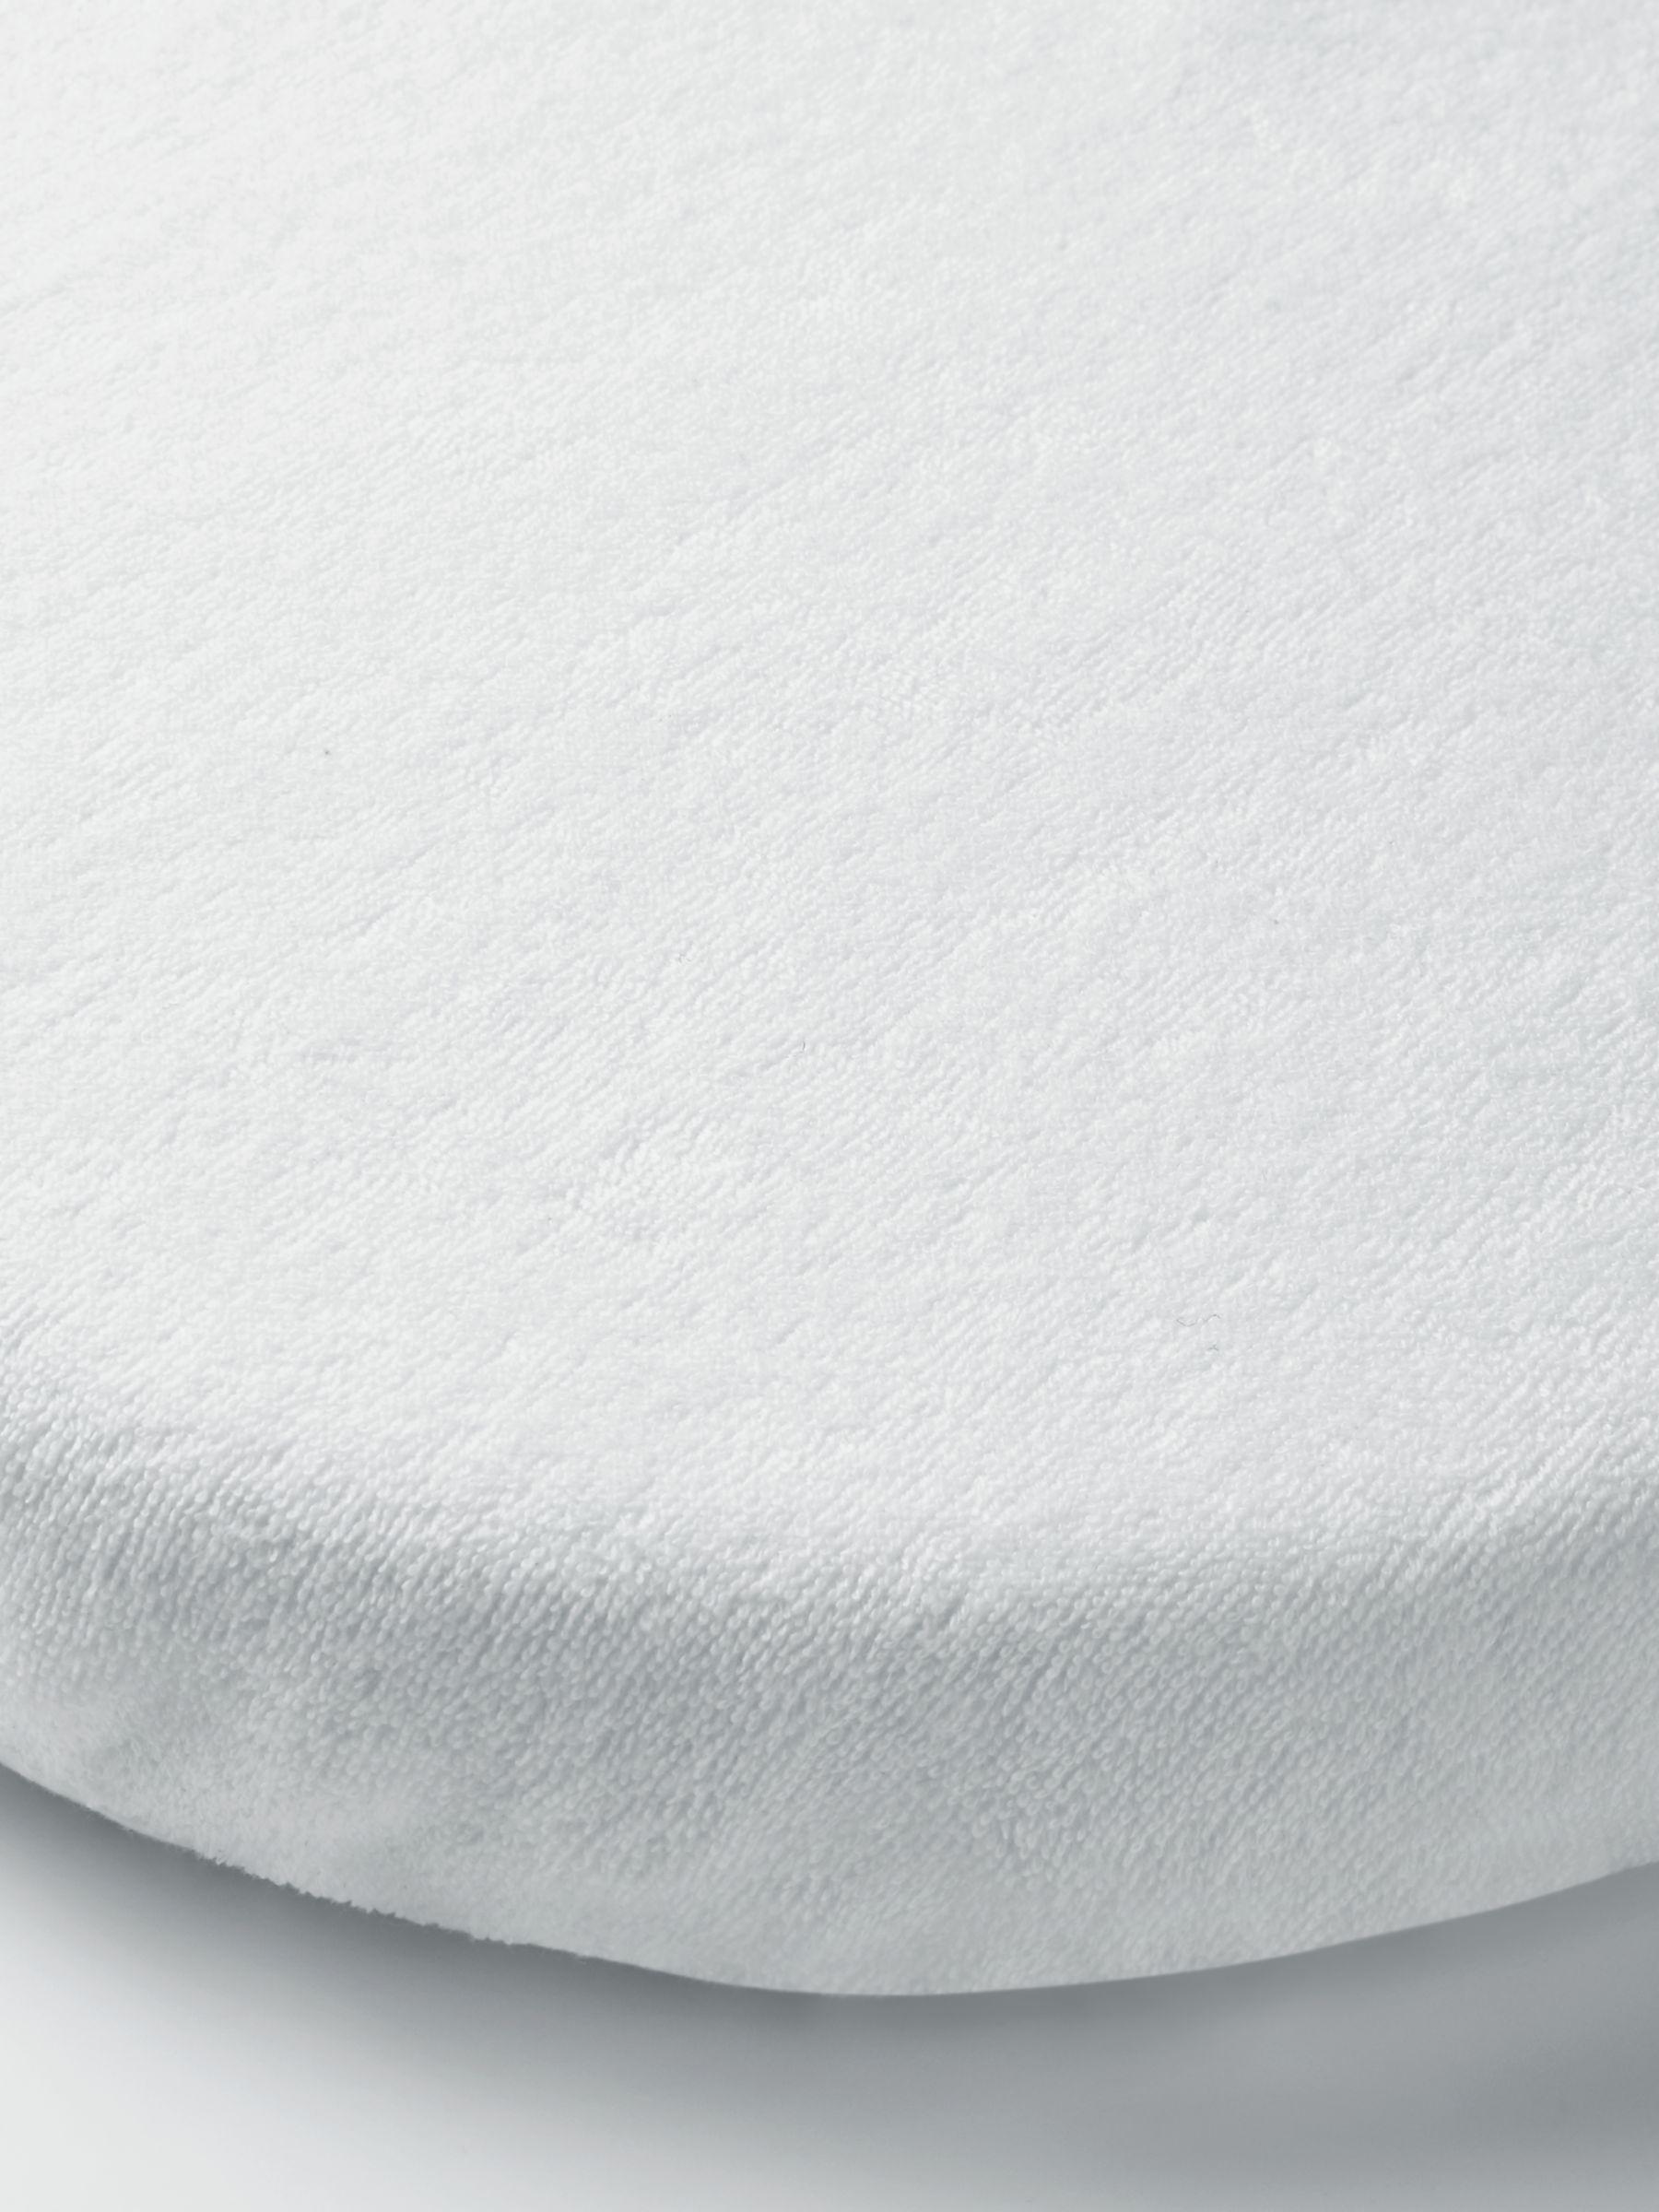 ANYDAY John Lewis & Partners Micro-Fresh Towelling Waterproof Pram, Crib or Moses Basket Mattress Protector